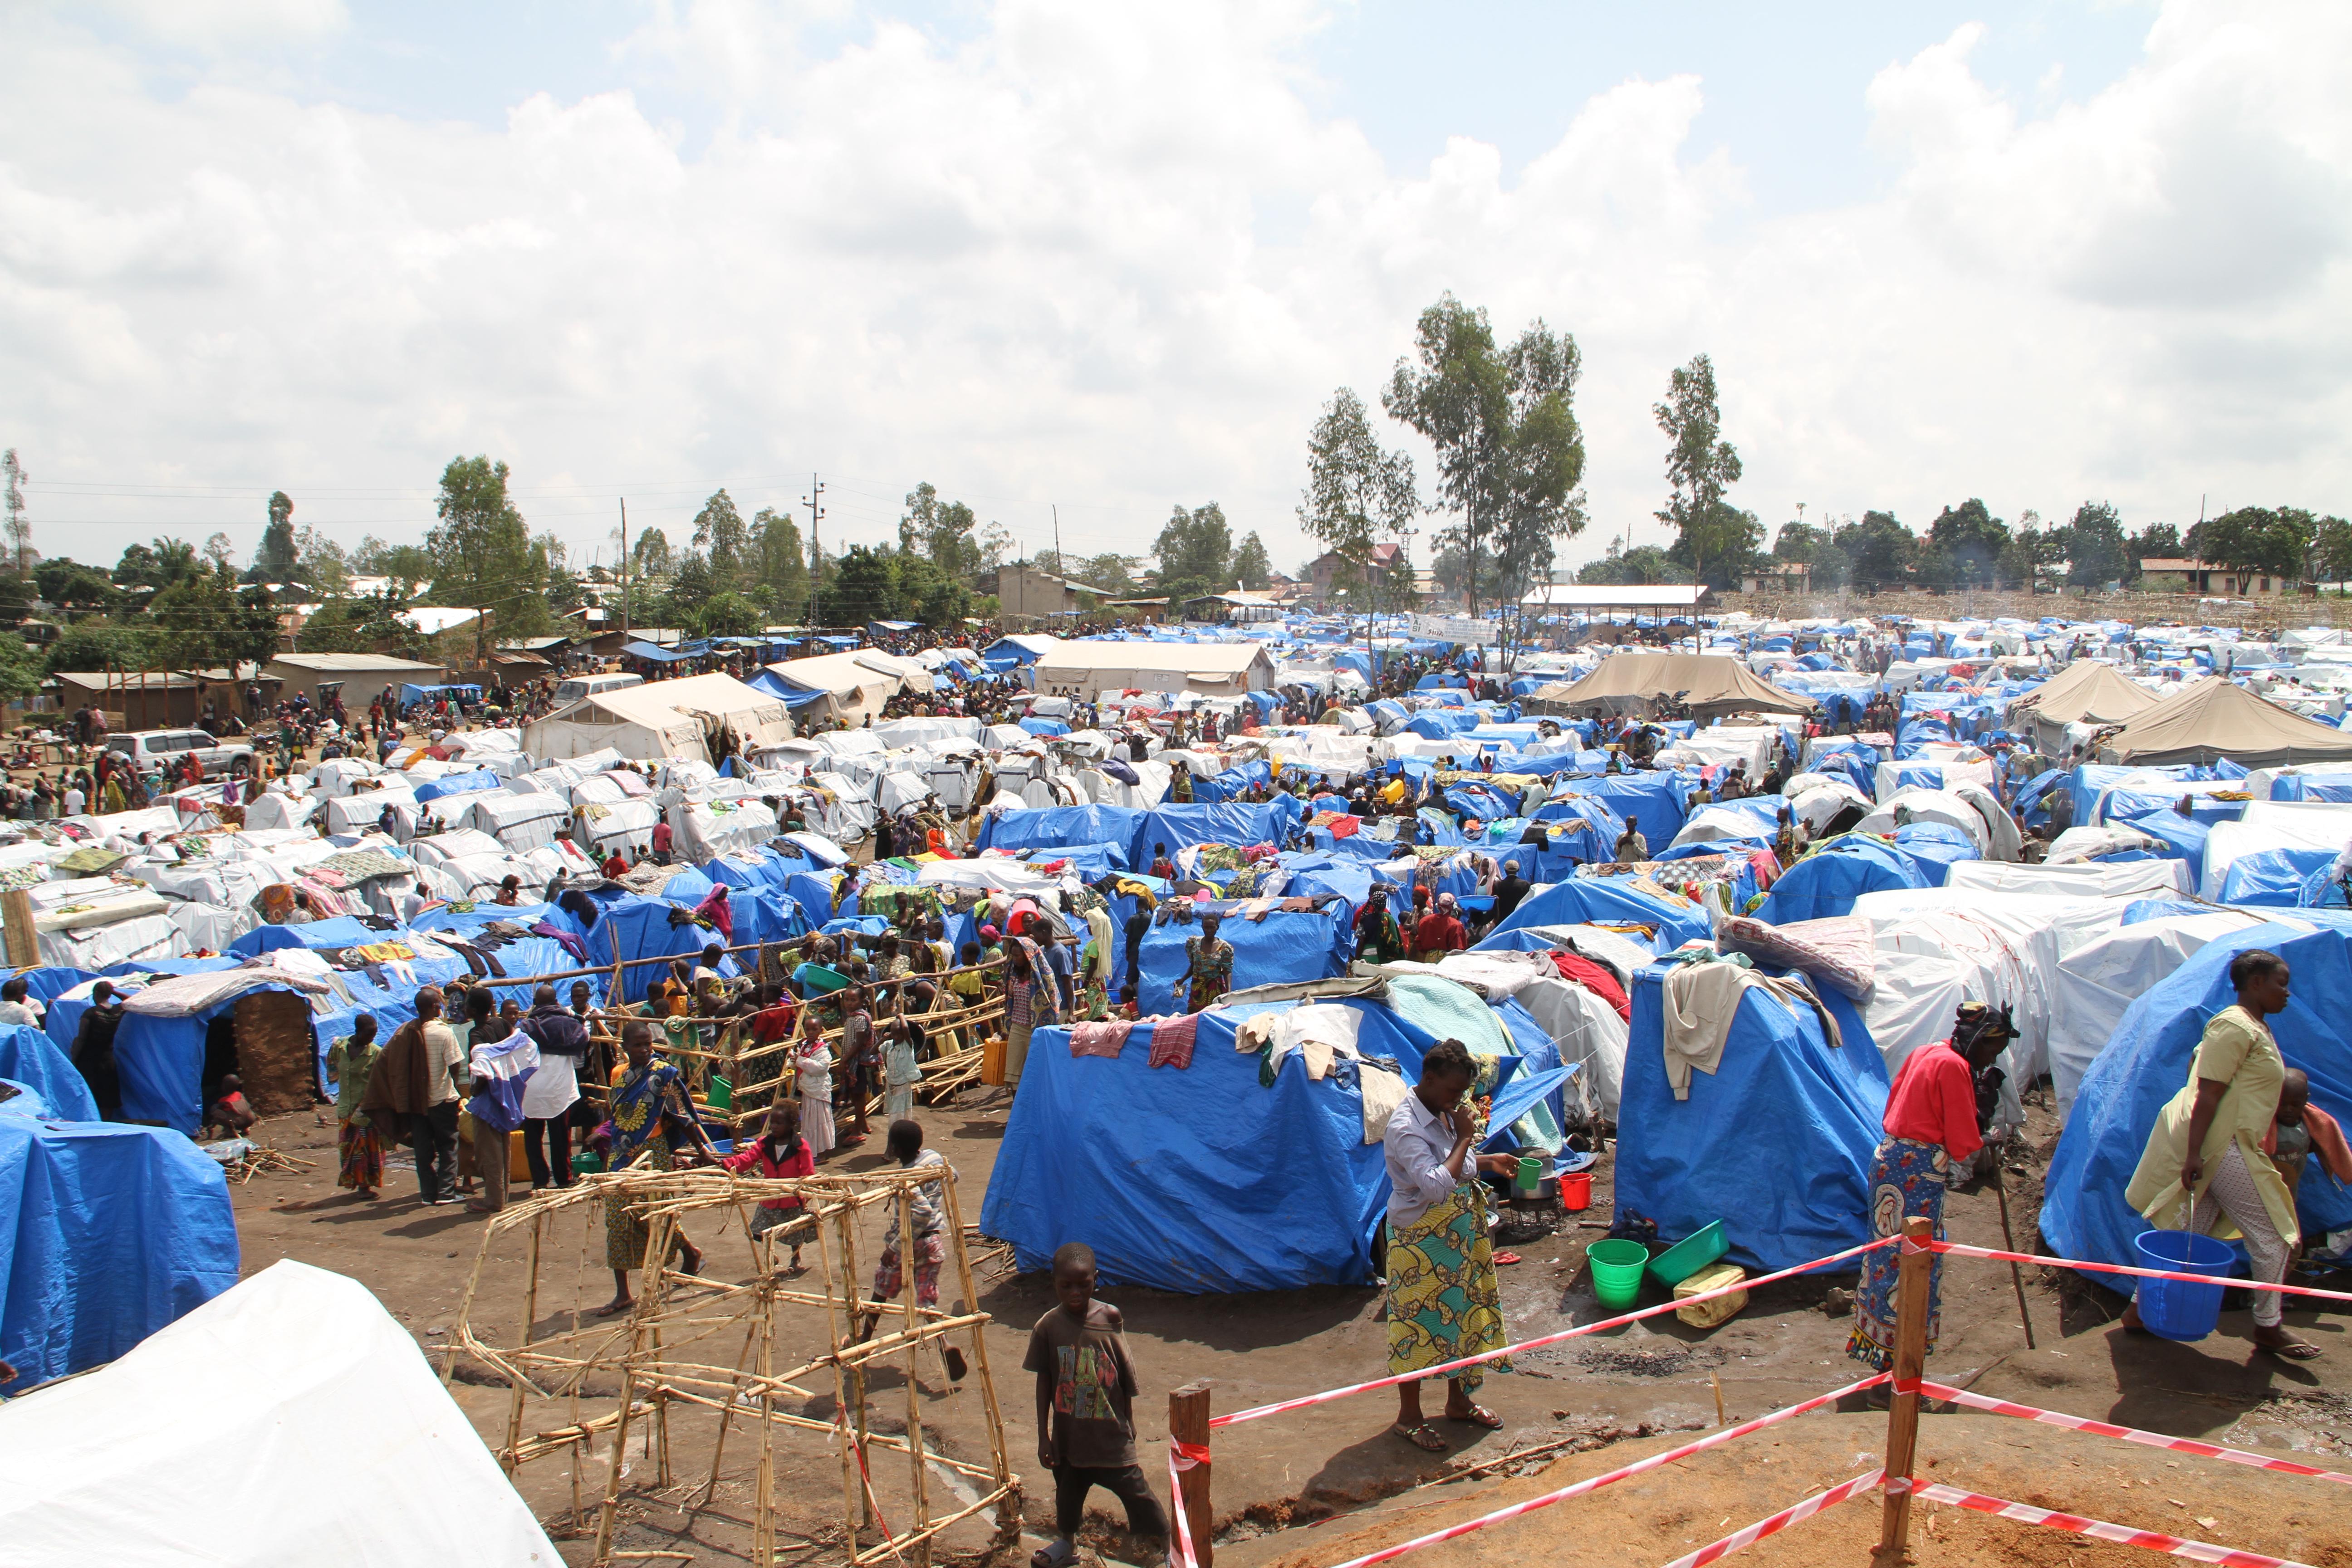 DRC, Democratic Republic of the Congo, IDP camp